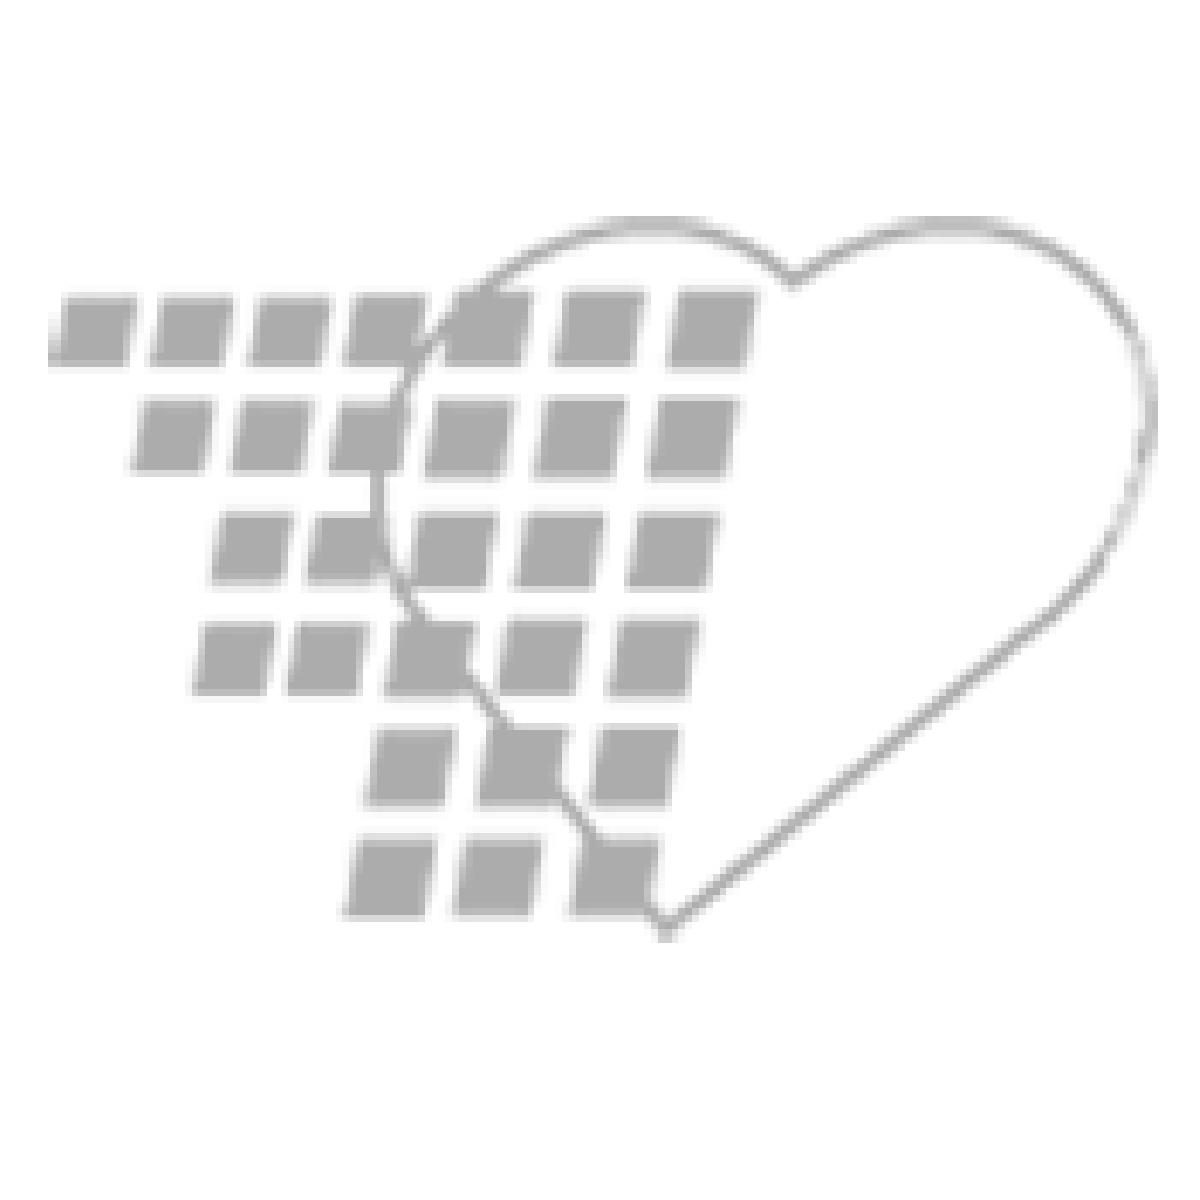 06-93-8505 Demo Dose® Naloxon Hydrochlorid (Narcn) 2mg/2mL